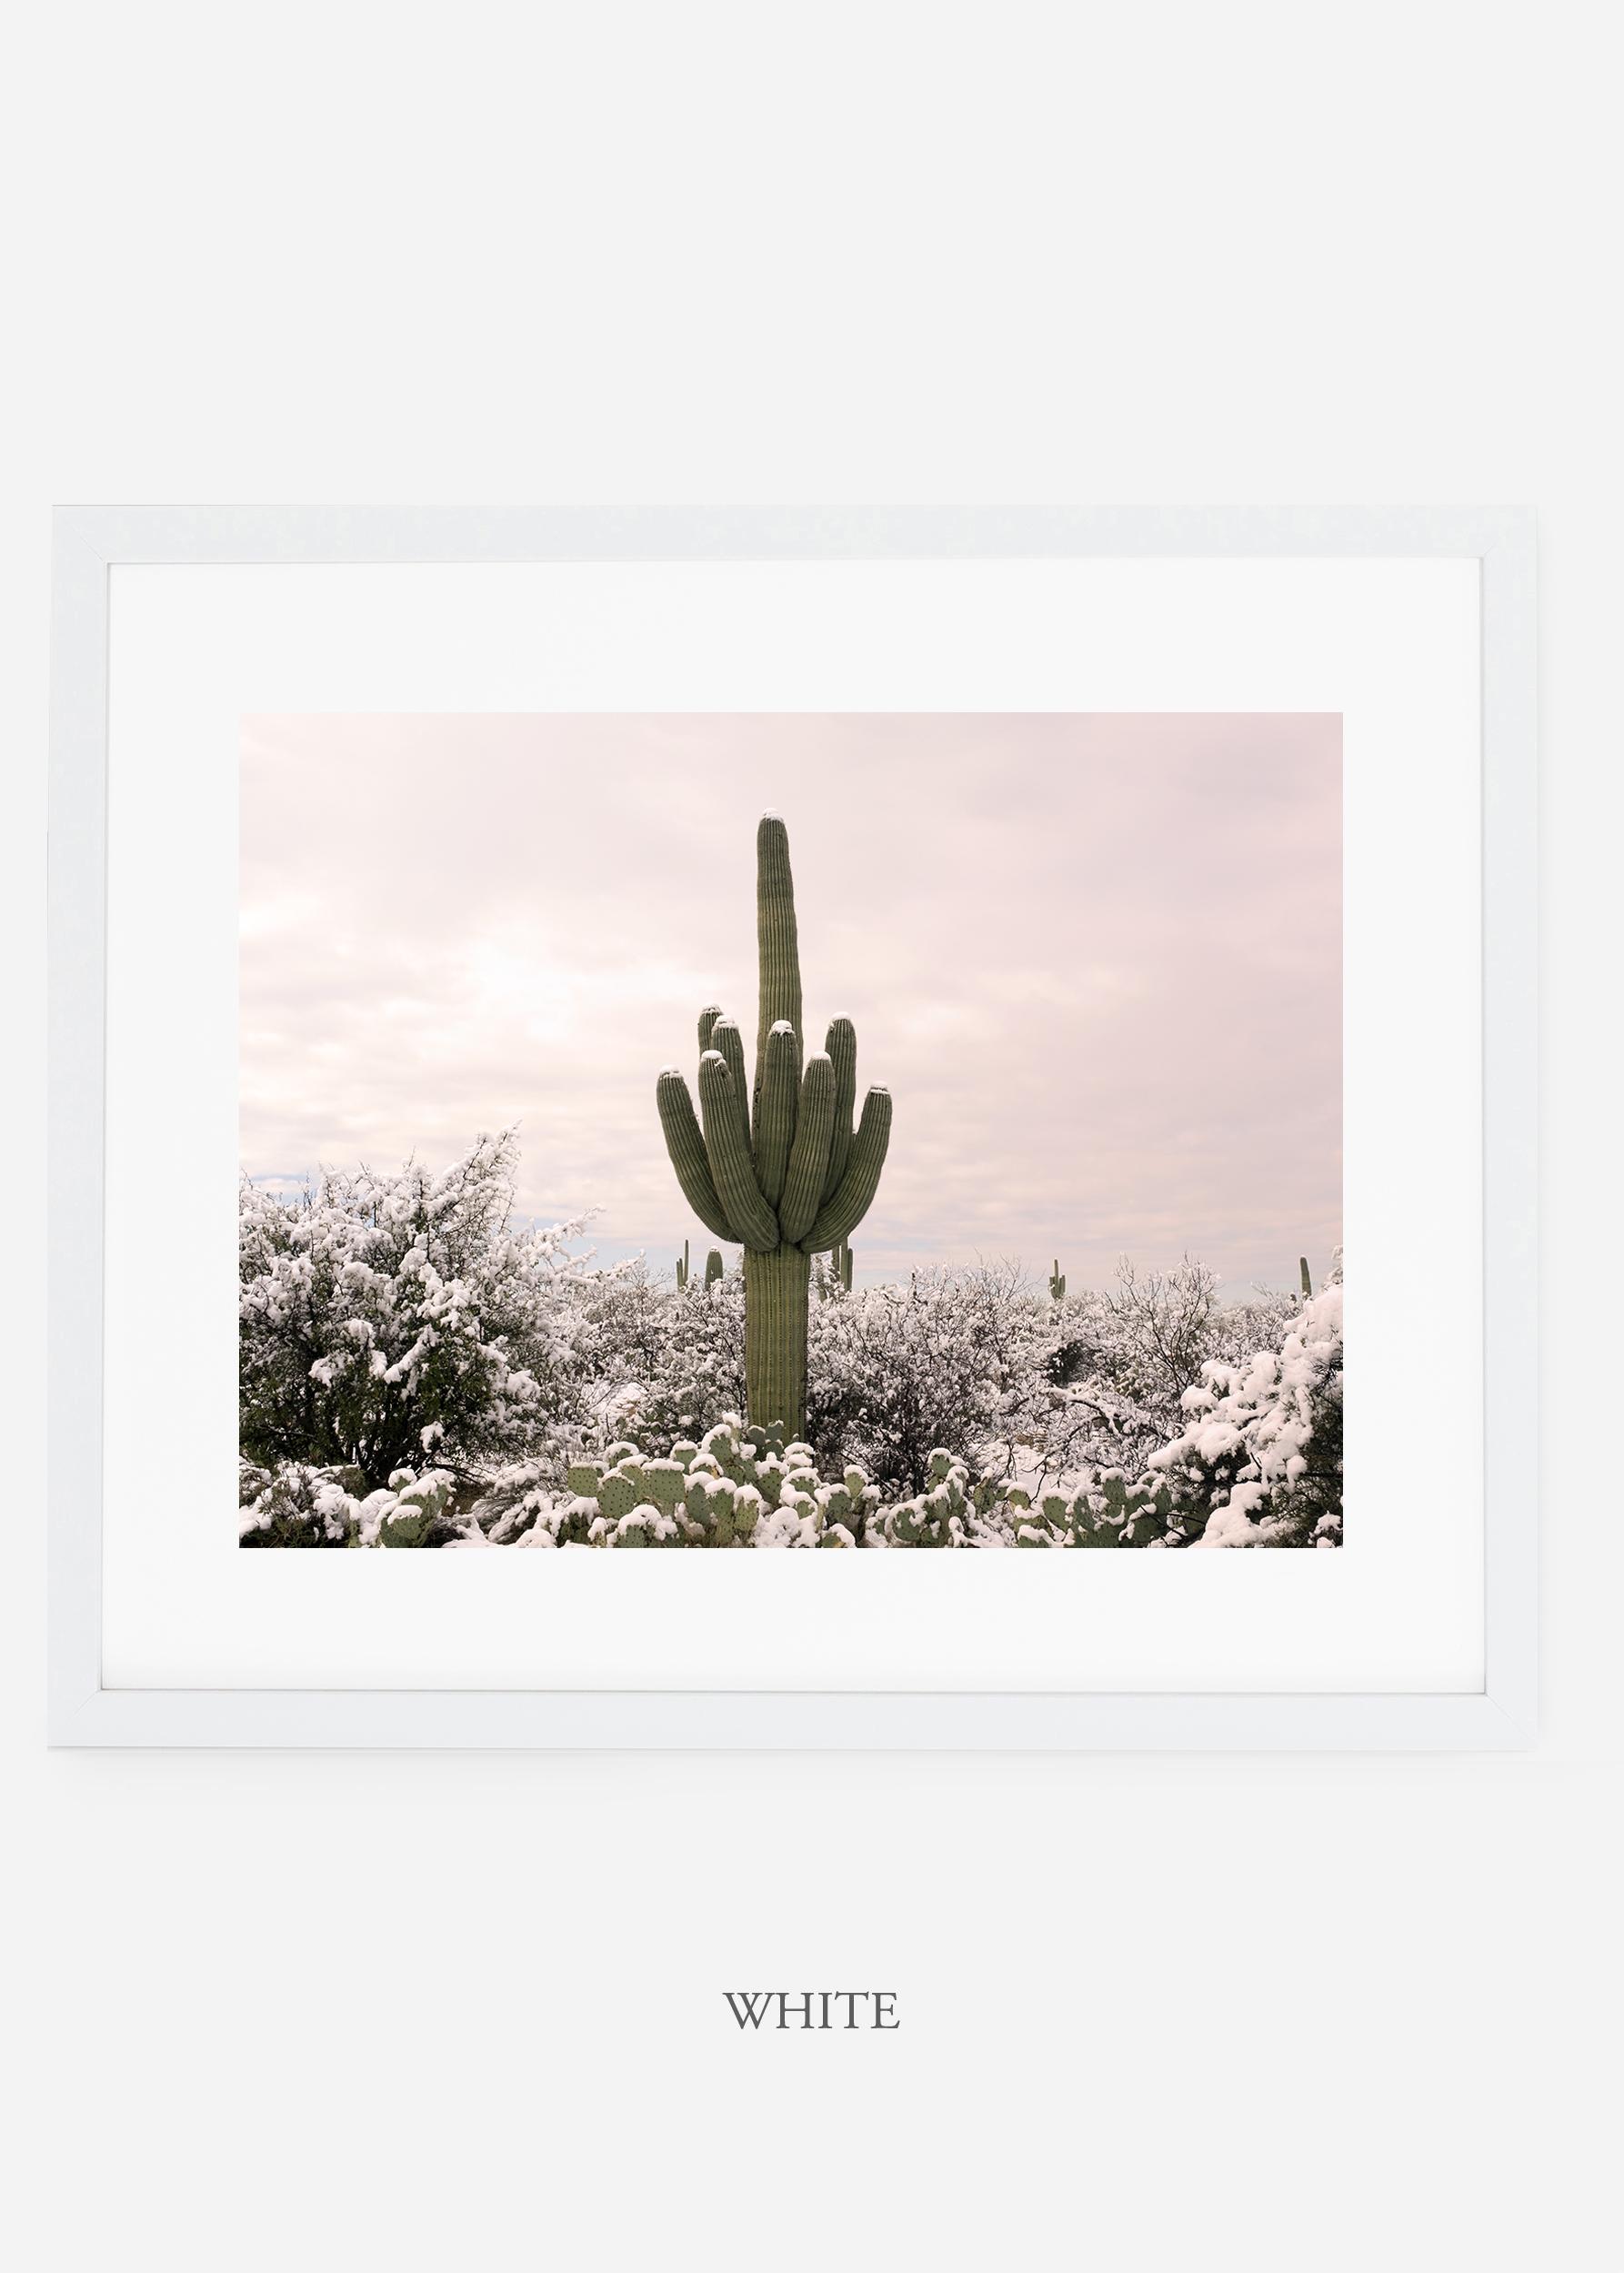 whiteframe-saguaroNo.3-wildercalifornia-art-wallart-cactusprint-homedecor-prints-arizona-botanical-artwork-interiordesign.jpg